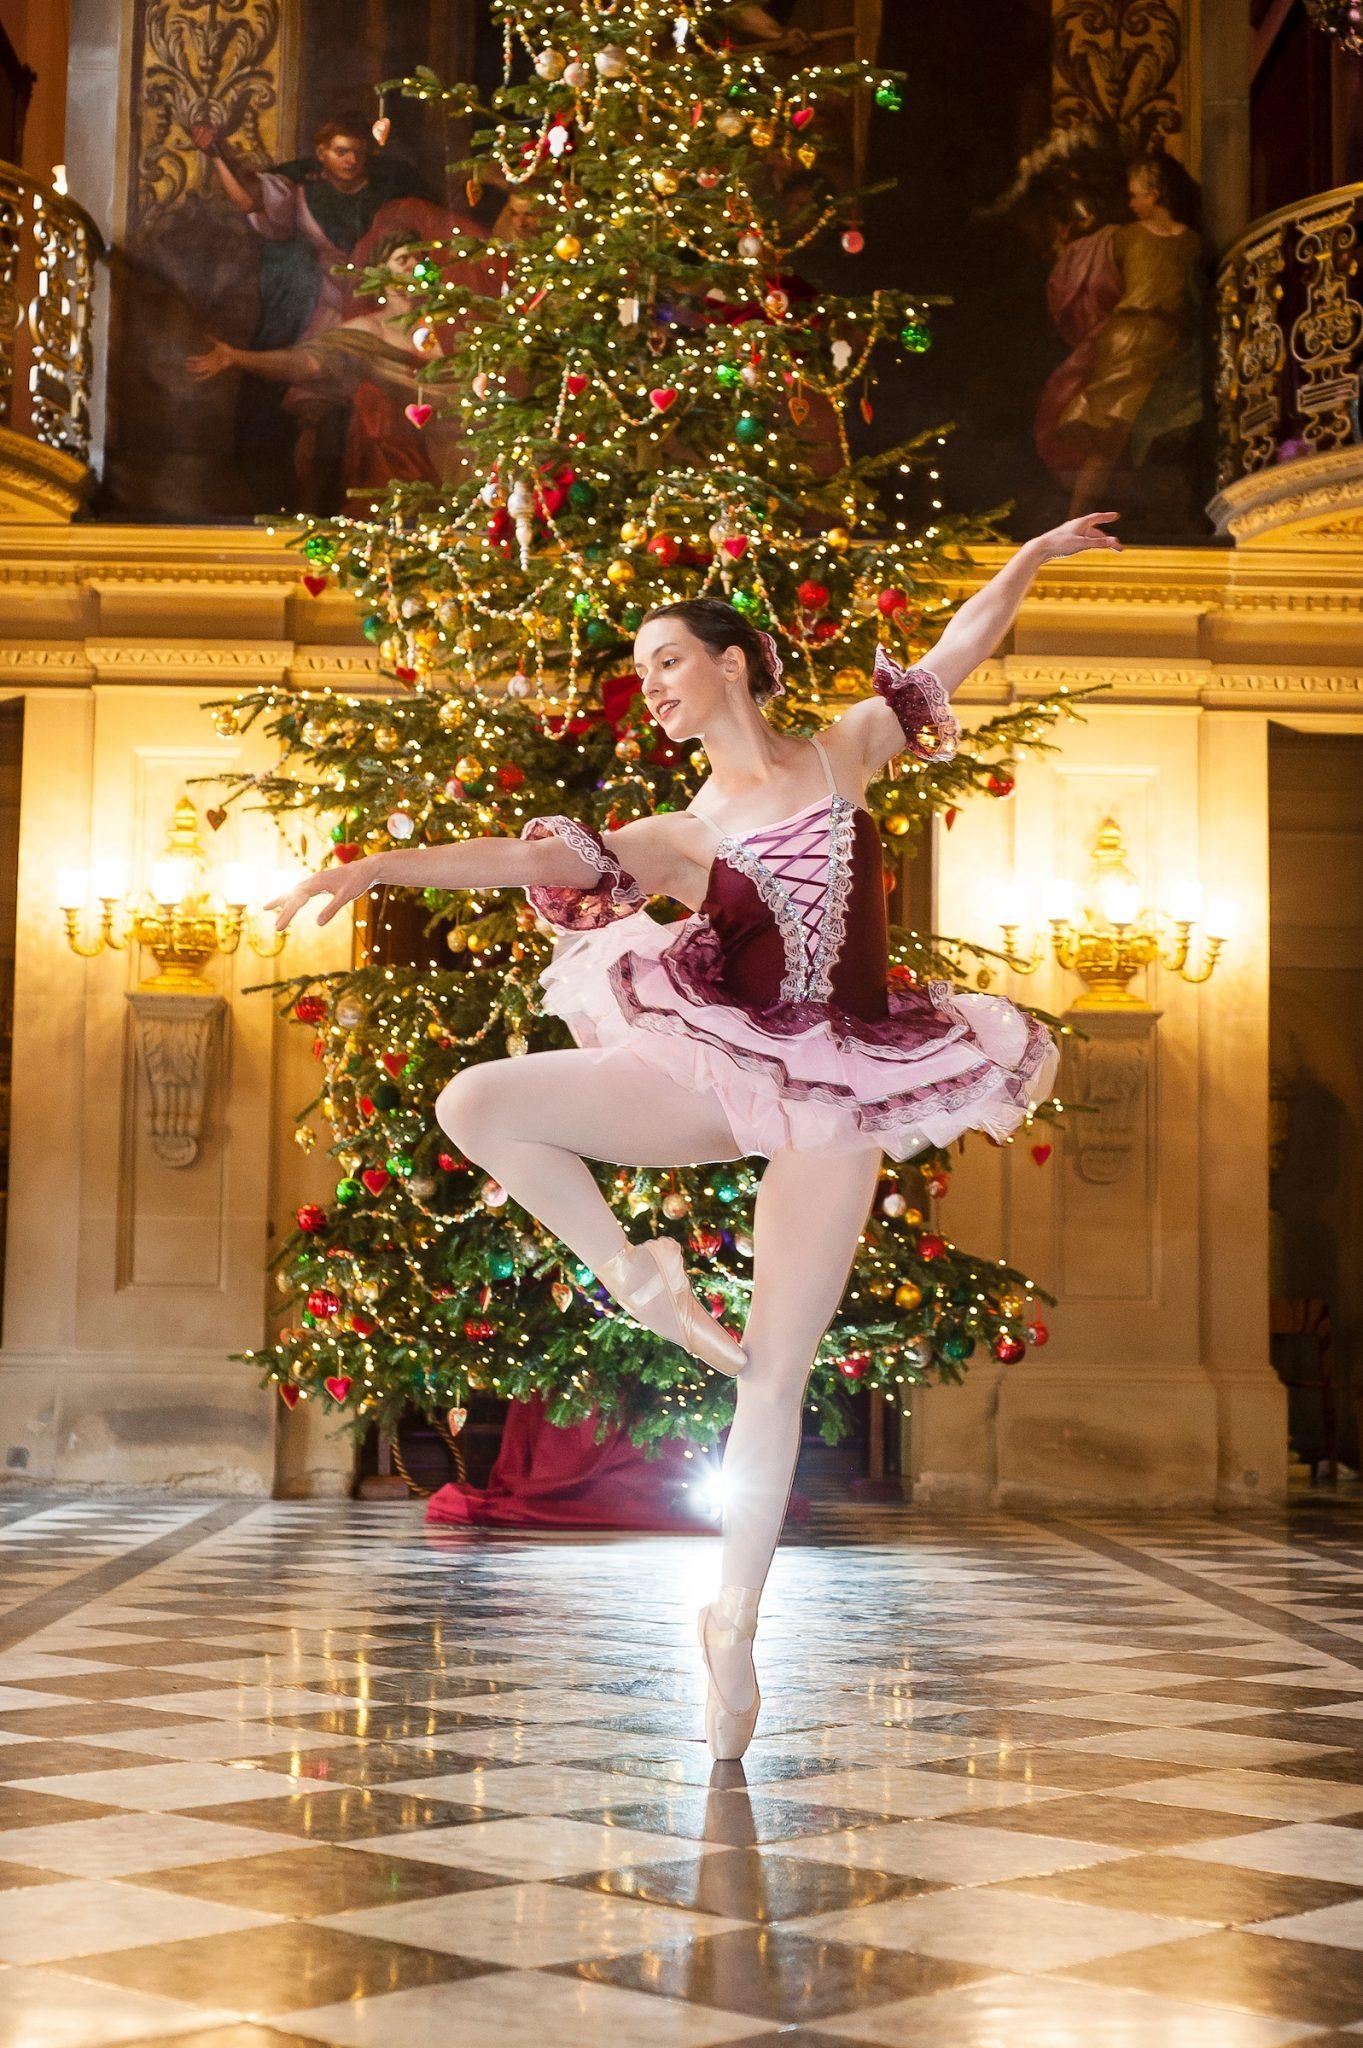 Ballerinas En Pointe with The Nutcracker at Chatsworth